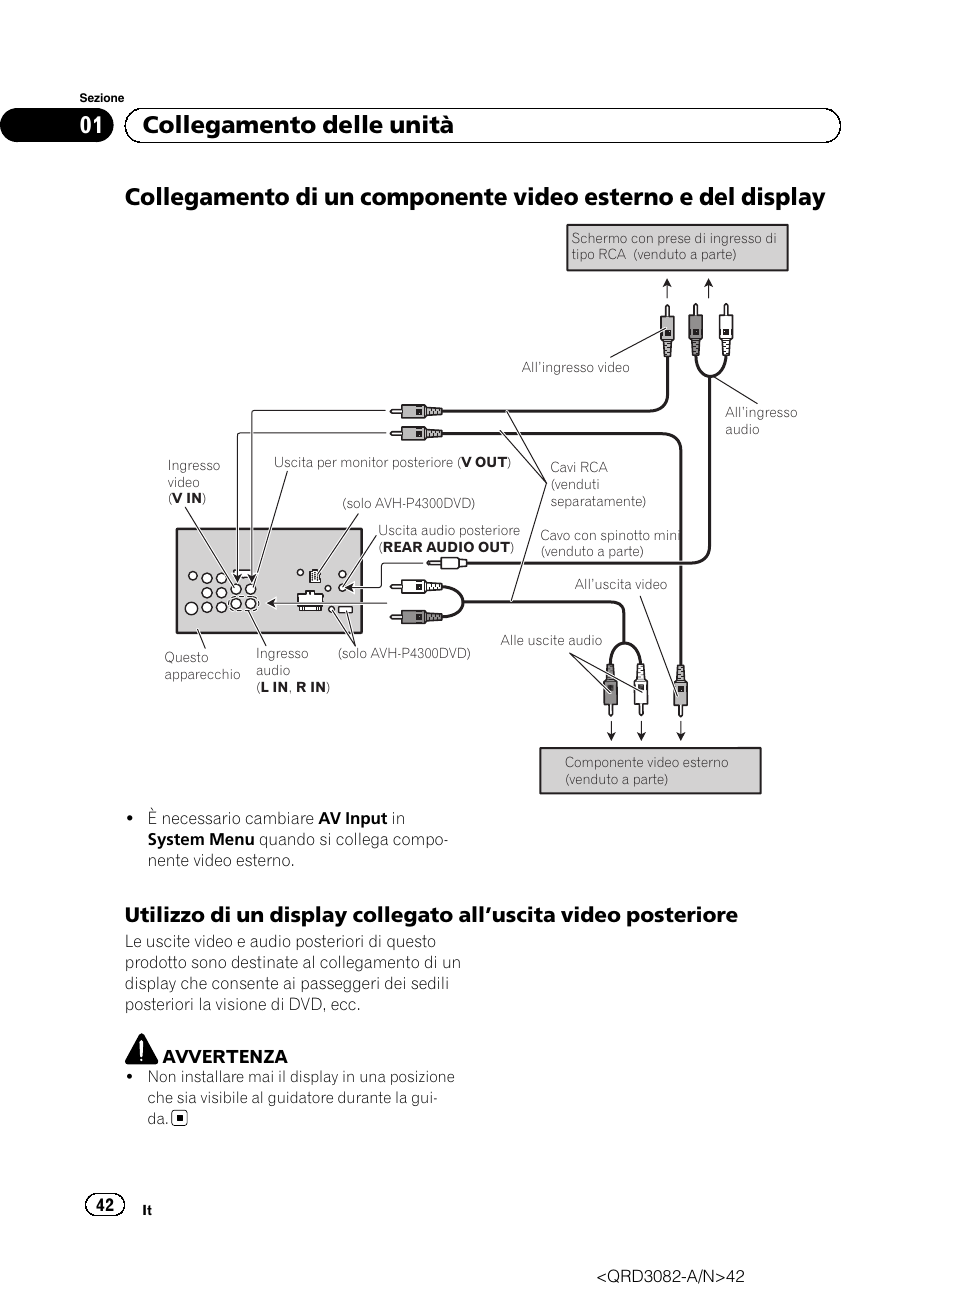 Wiring Diagram For Pioneer Avh P4300dvd Schematic Diagrams P3300bt 01 Collegamento Delle Unit User Manual